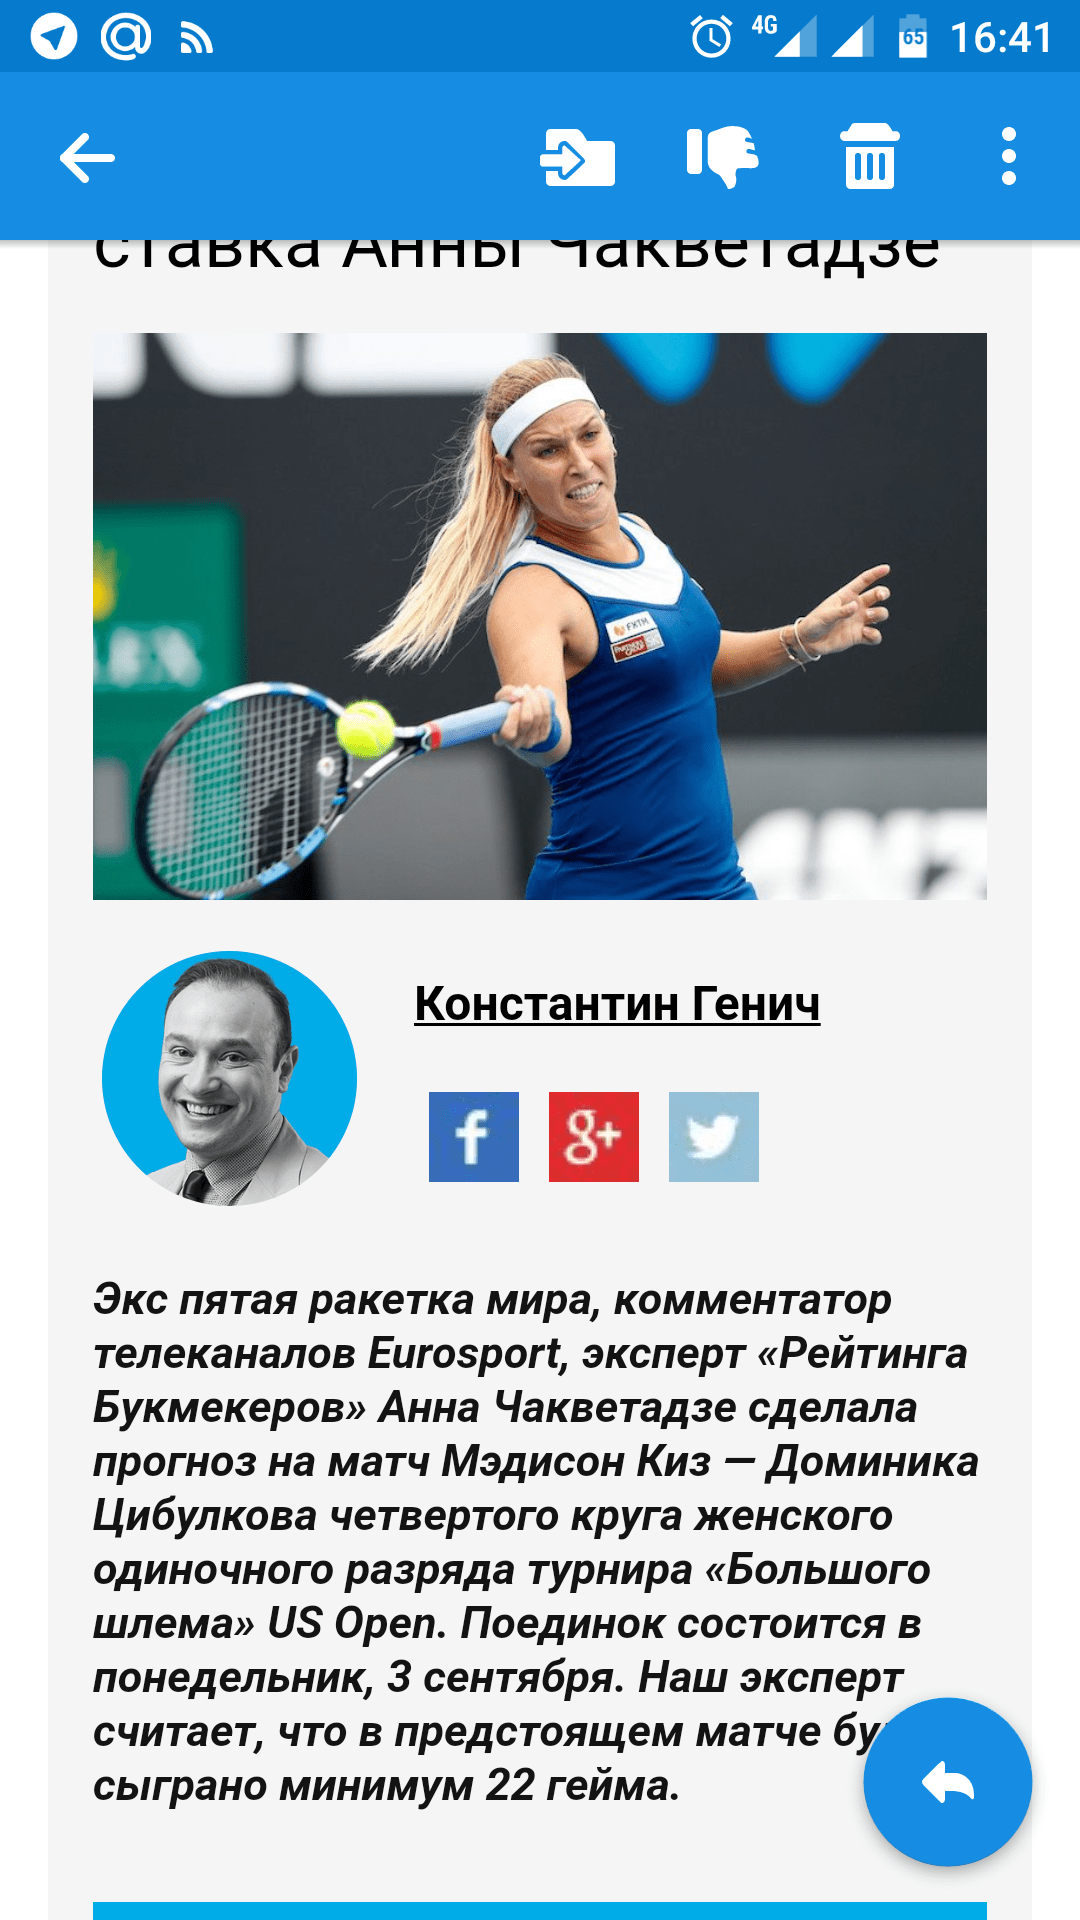 Прогноз на матч: Доминика Цибулкова – Дарья Гаврилова – 2 октября 2018 года